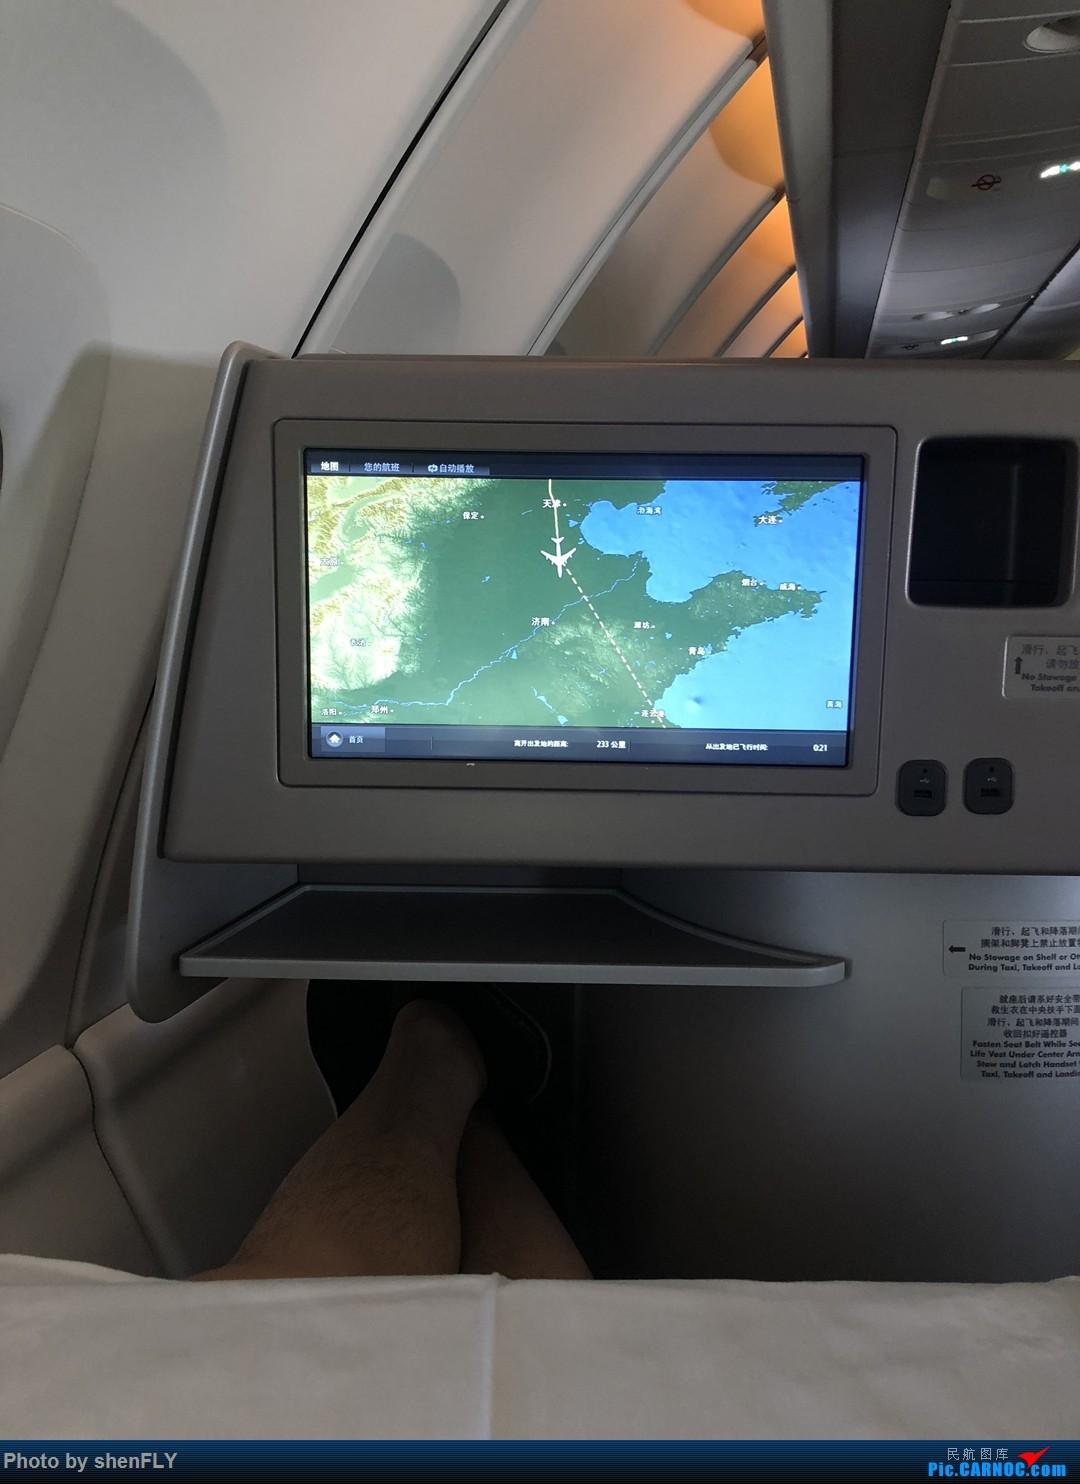 Re:[原创]【京沪快线四发之旅】国航B747-8I 超经+上层公务往返之旅 BOEING 747-8I B-2486 中国北京首都国际机场